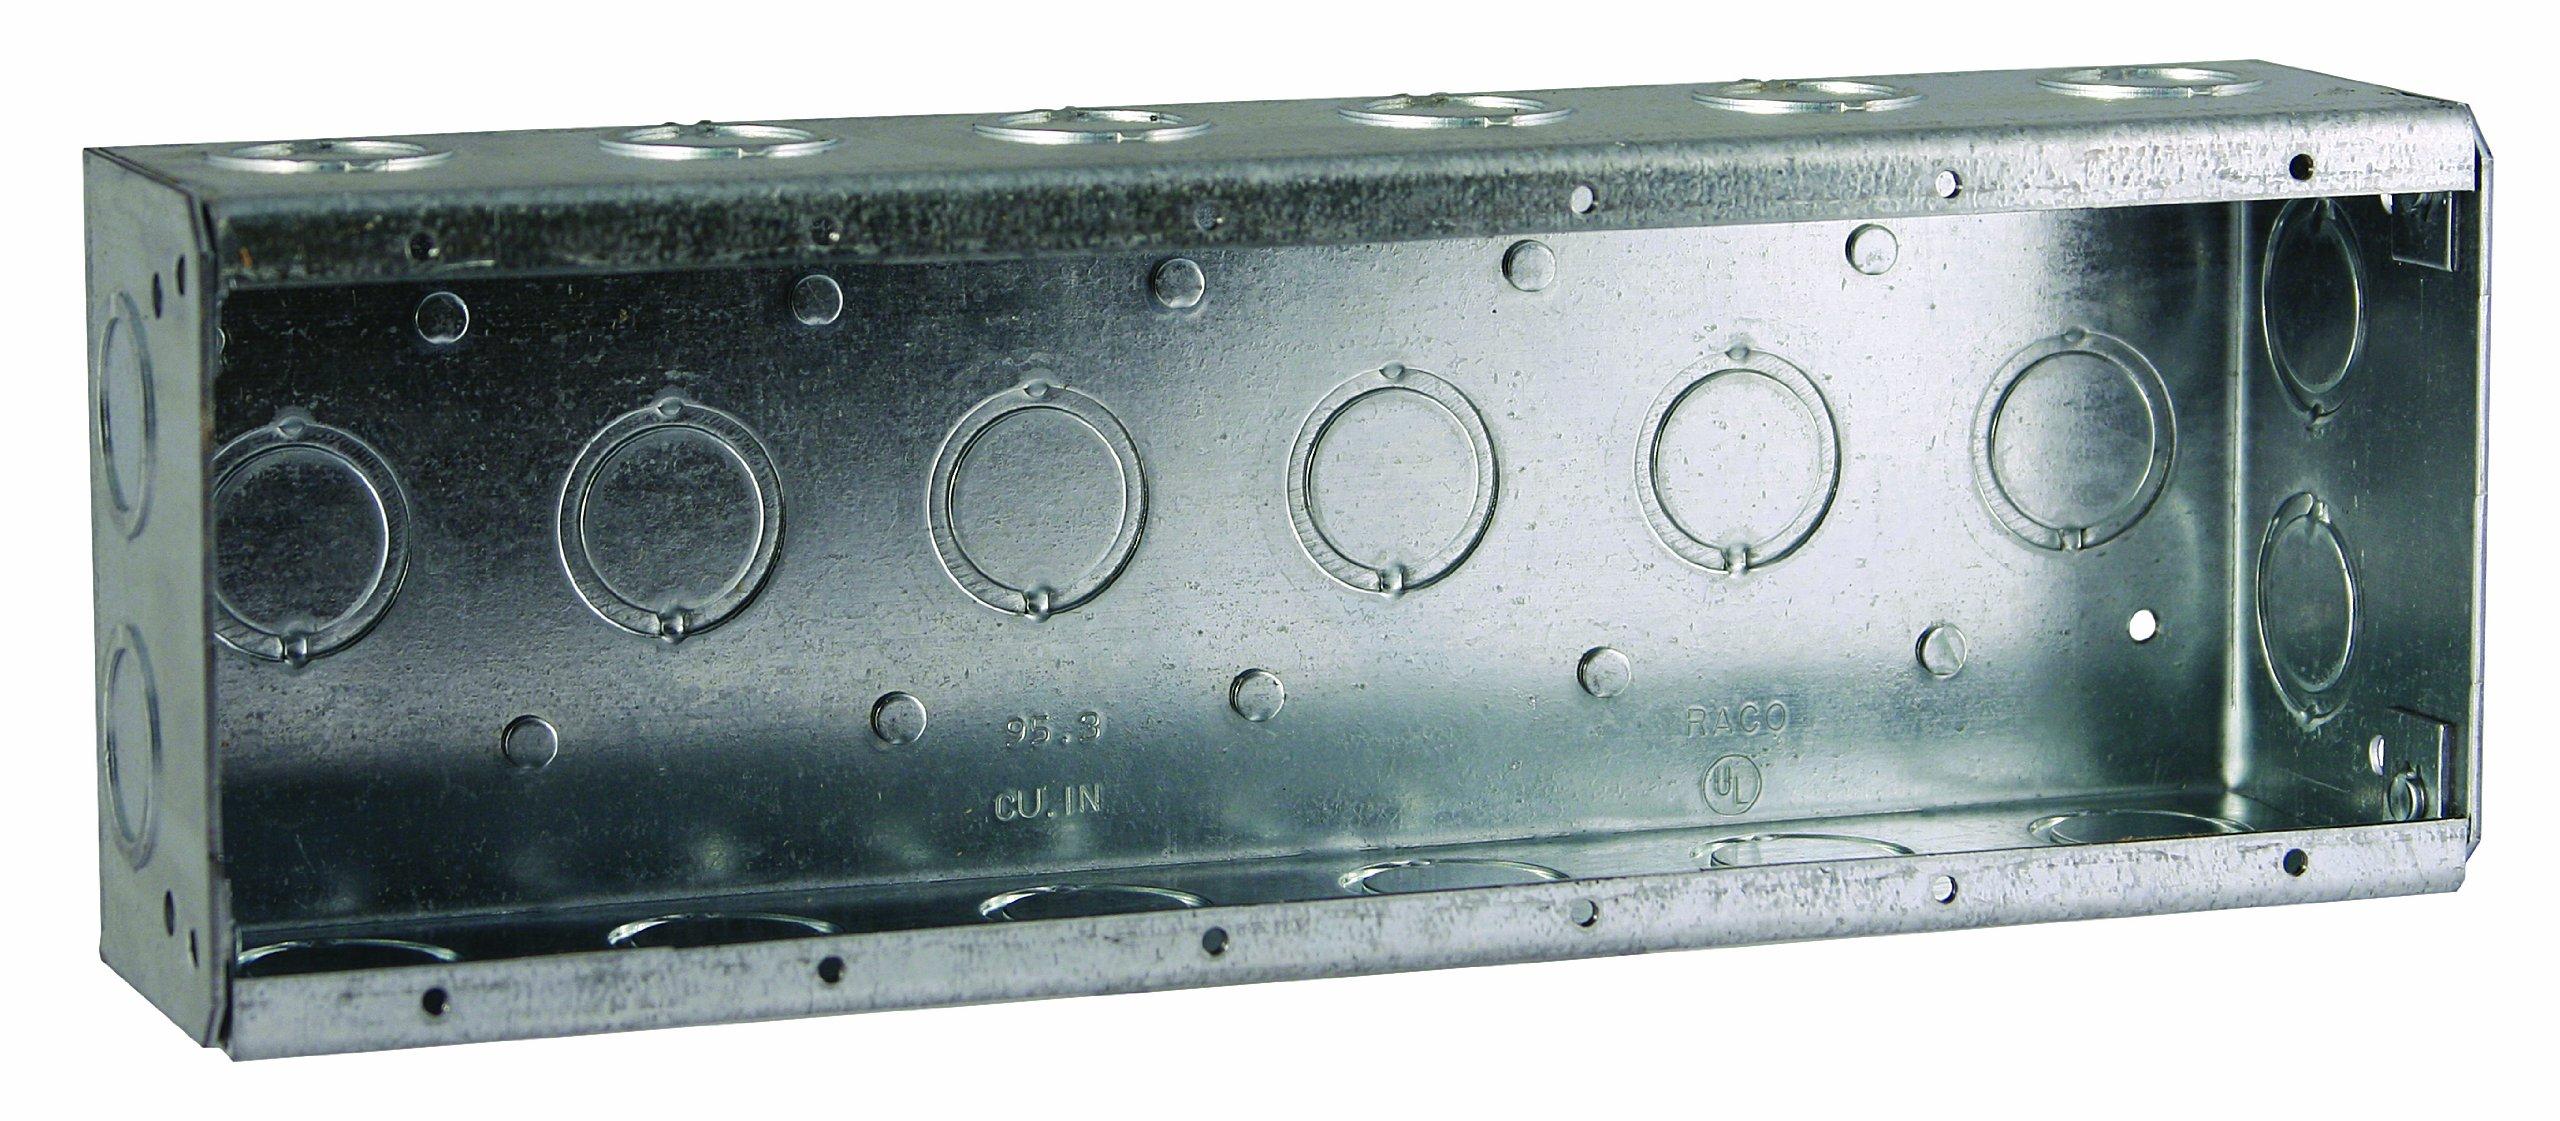 Hubbell-Raco 960 2-1/2-Inch Deep 95.3 Cubic Inch 6-Gang Nongangable Masonry Box